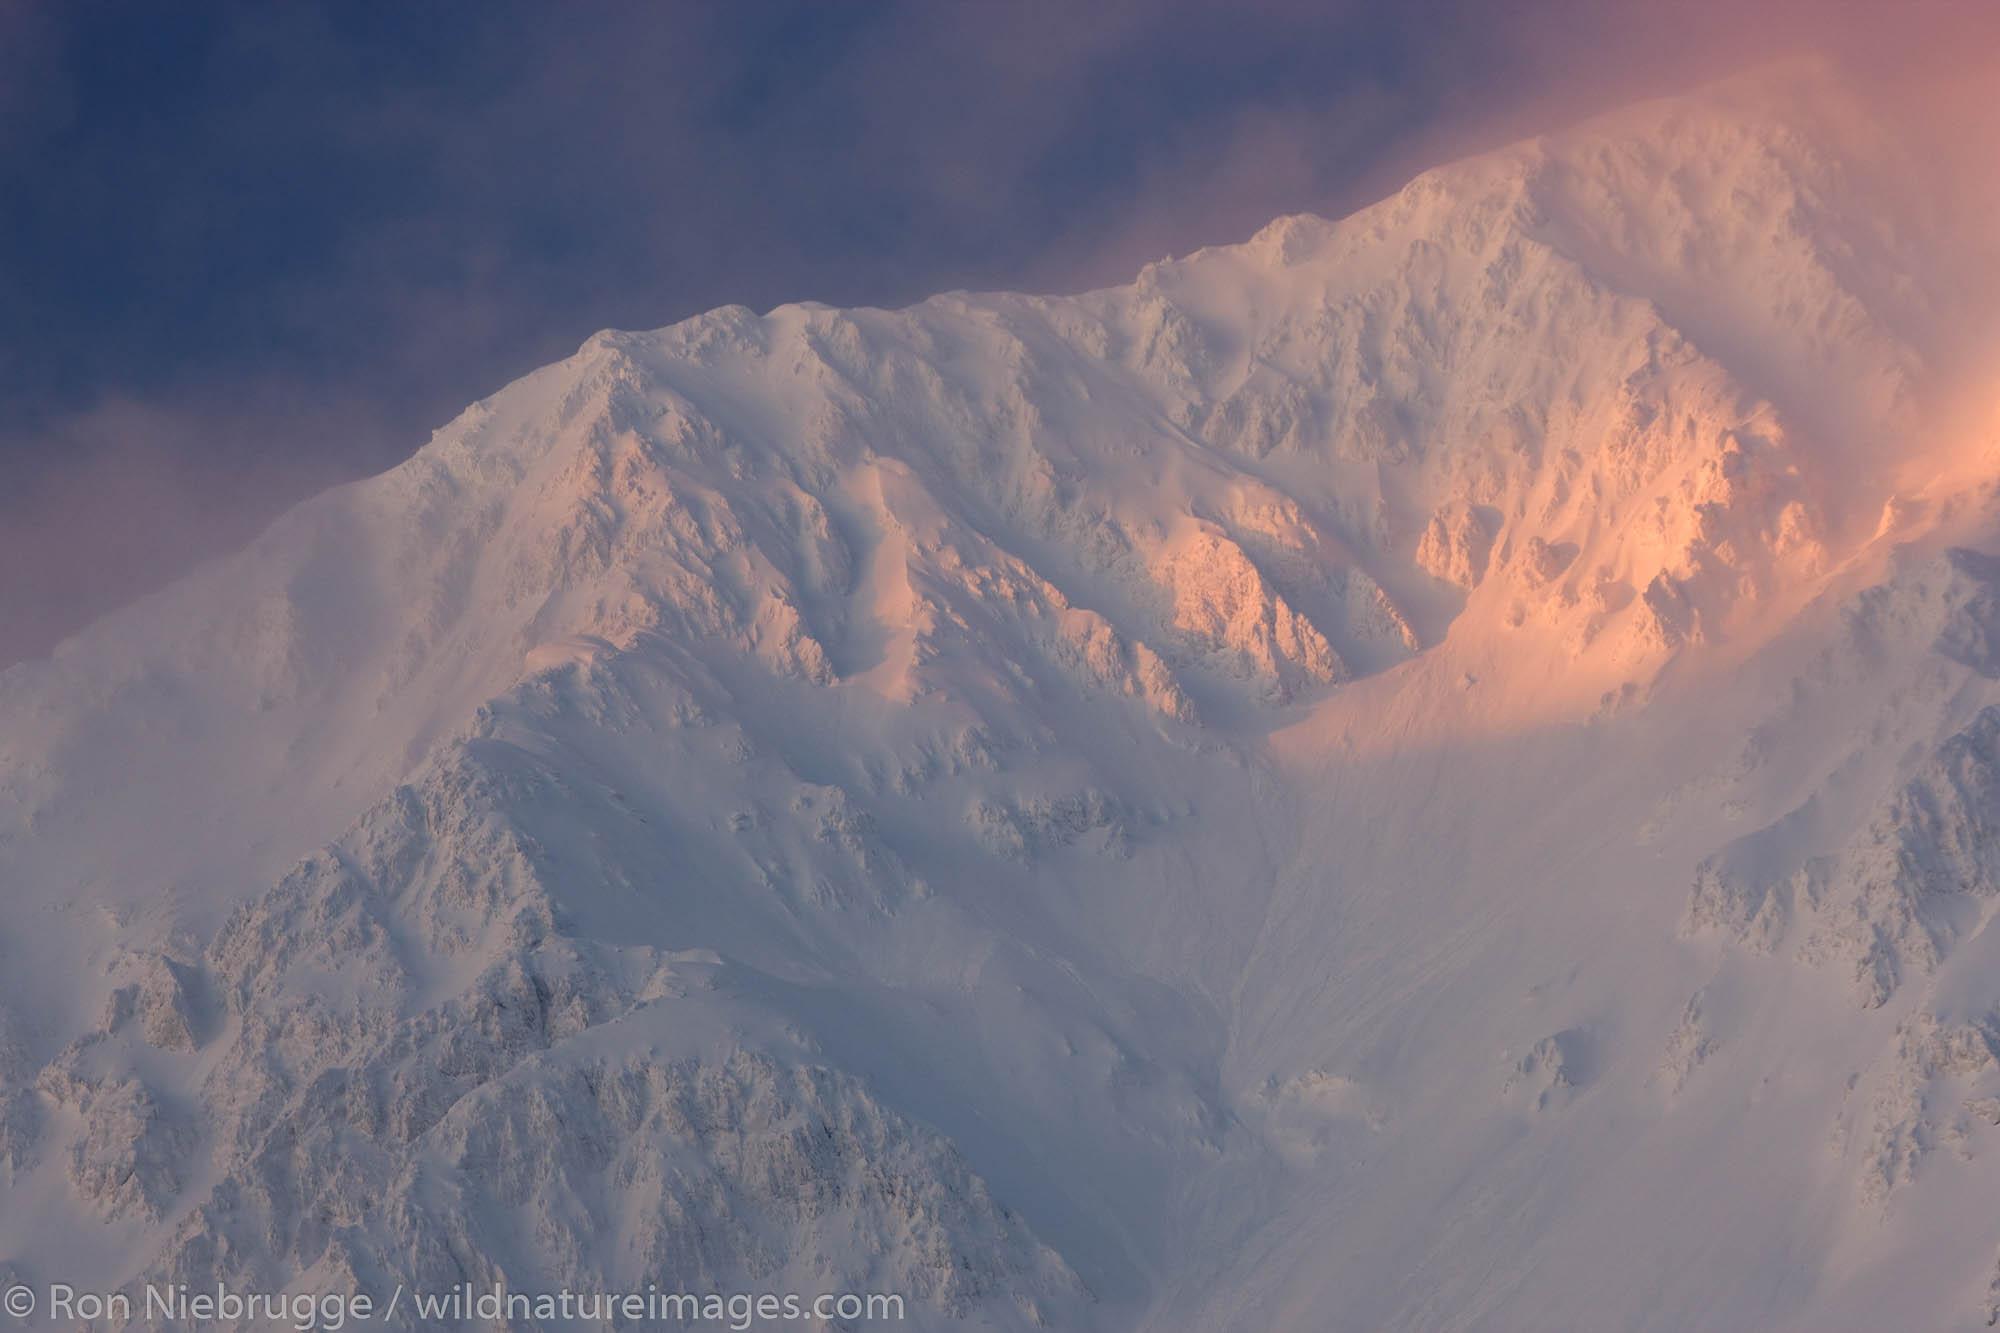 Resurrection Peak in winter, Chugach National Forest, Seward, Alaska.